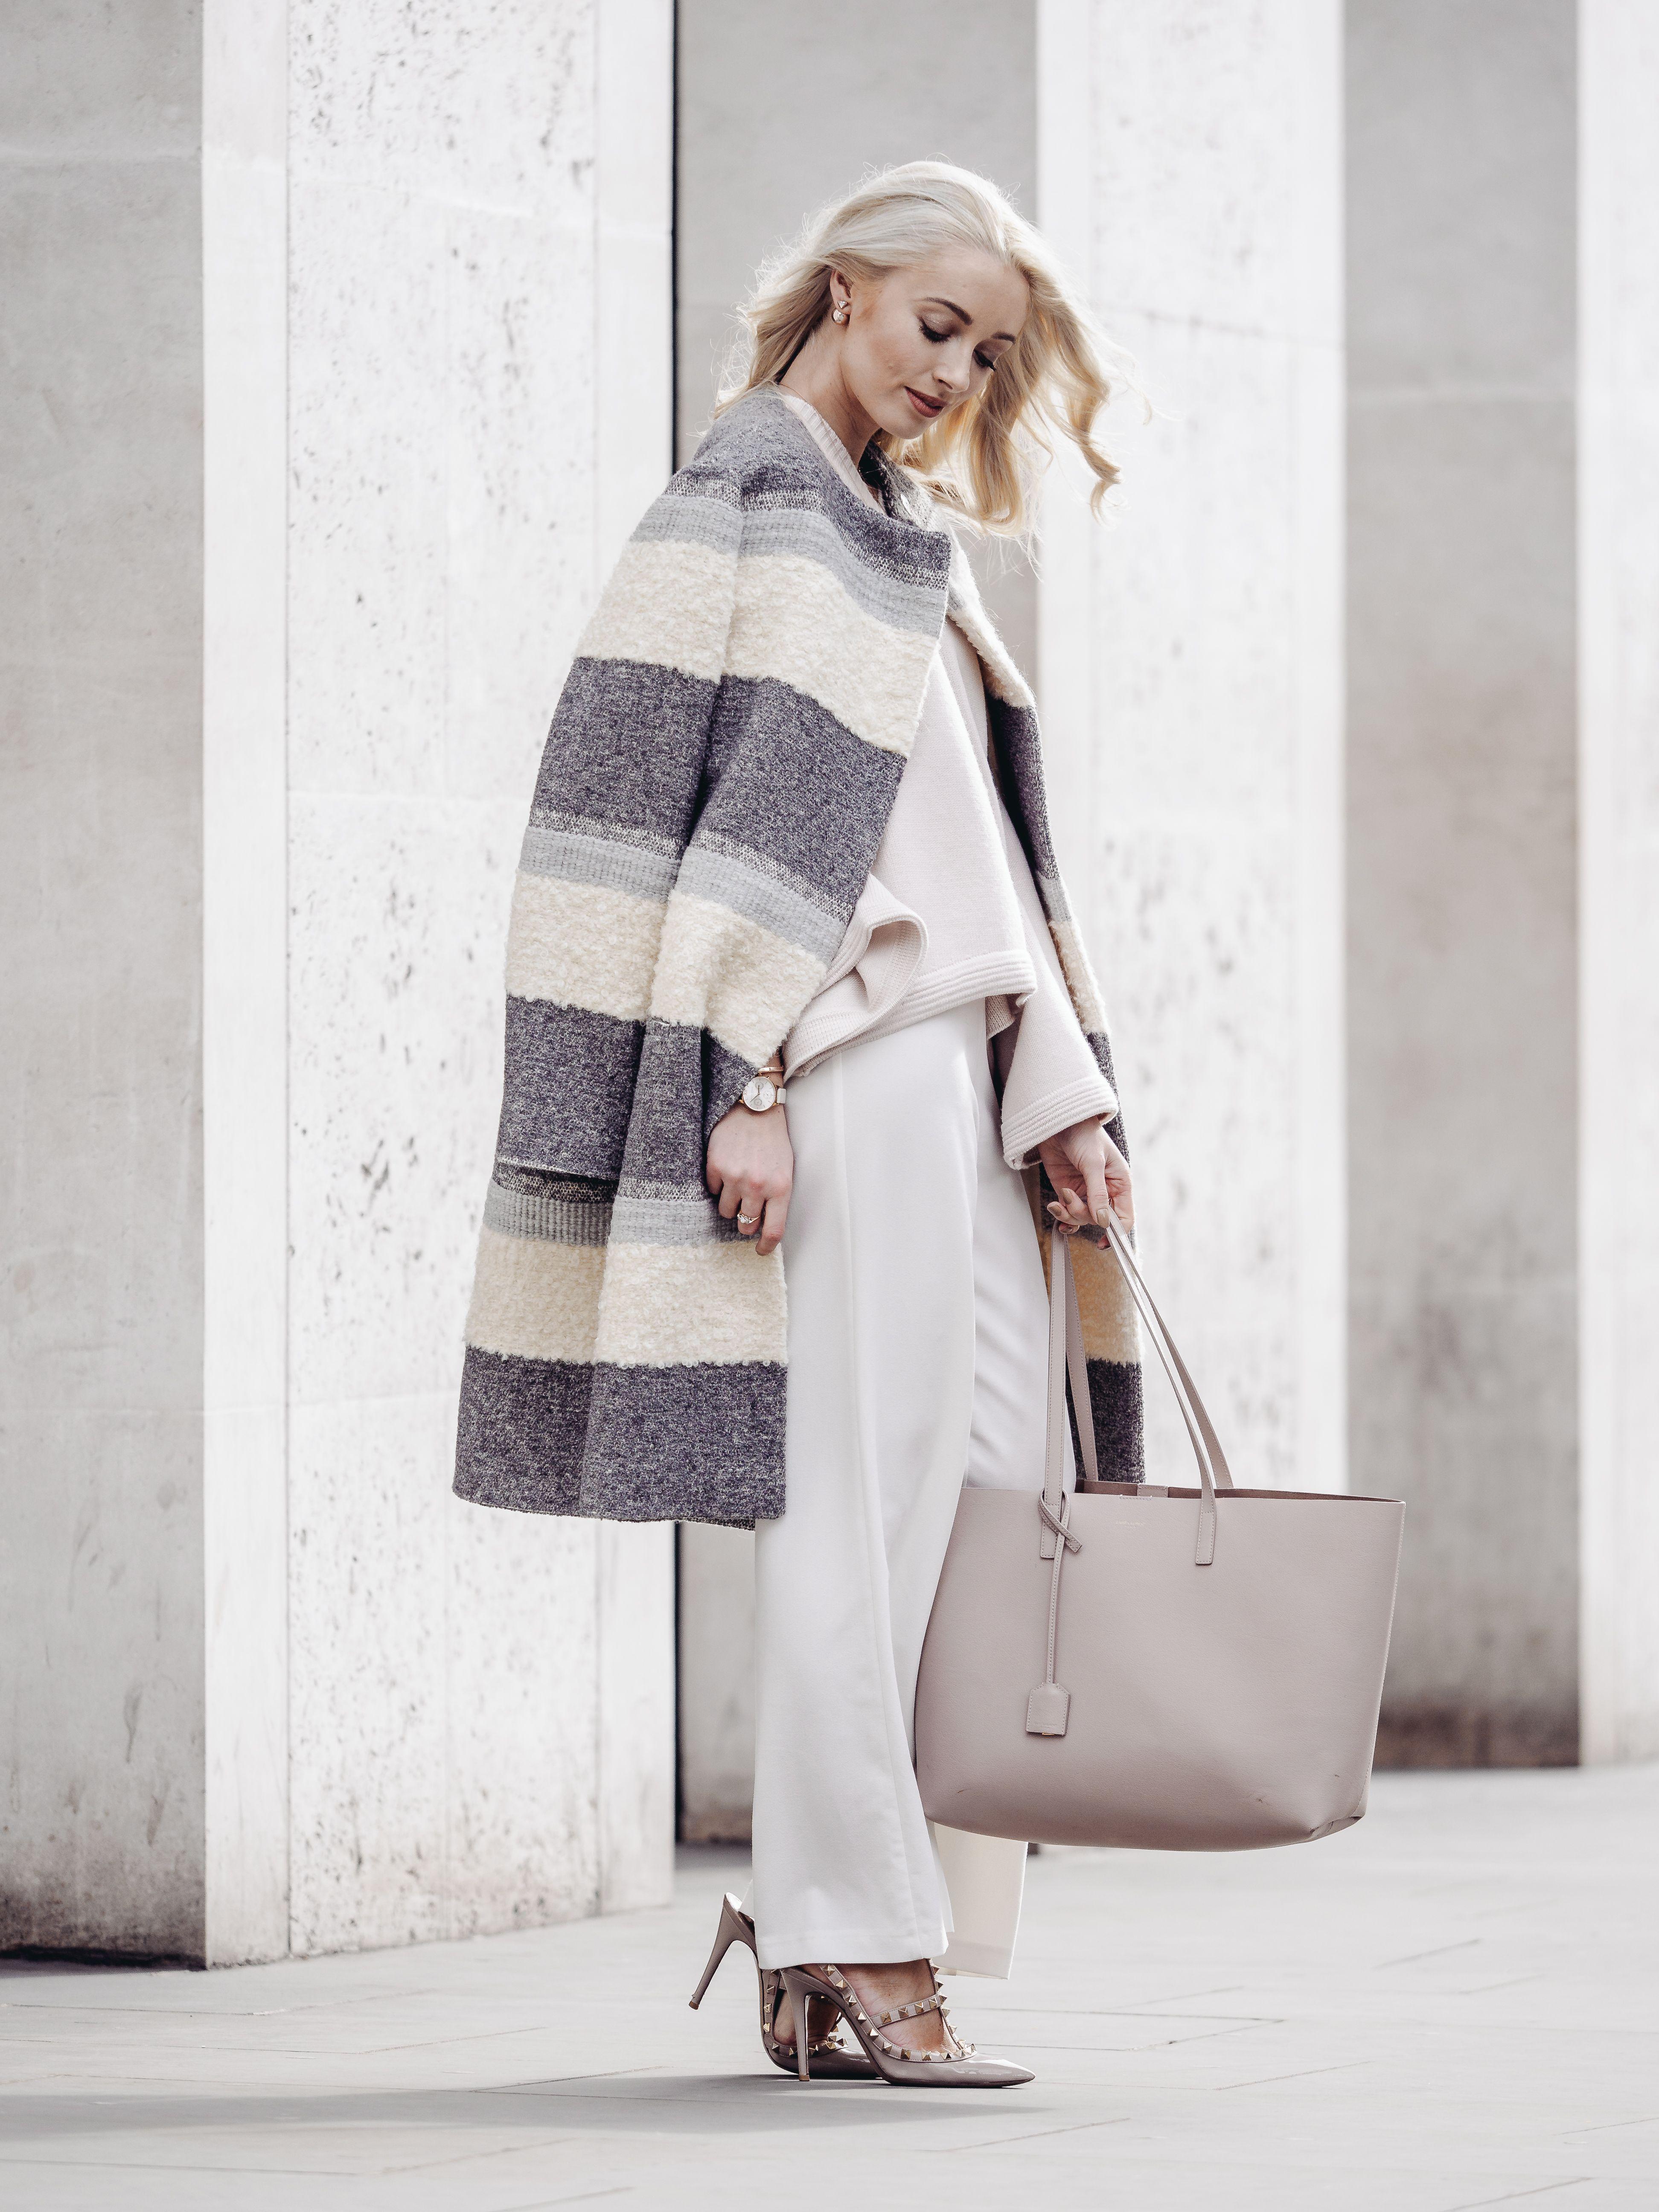 WHAT I WORE TO LONDON FASHION WEEK Fashion mumblr